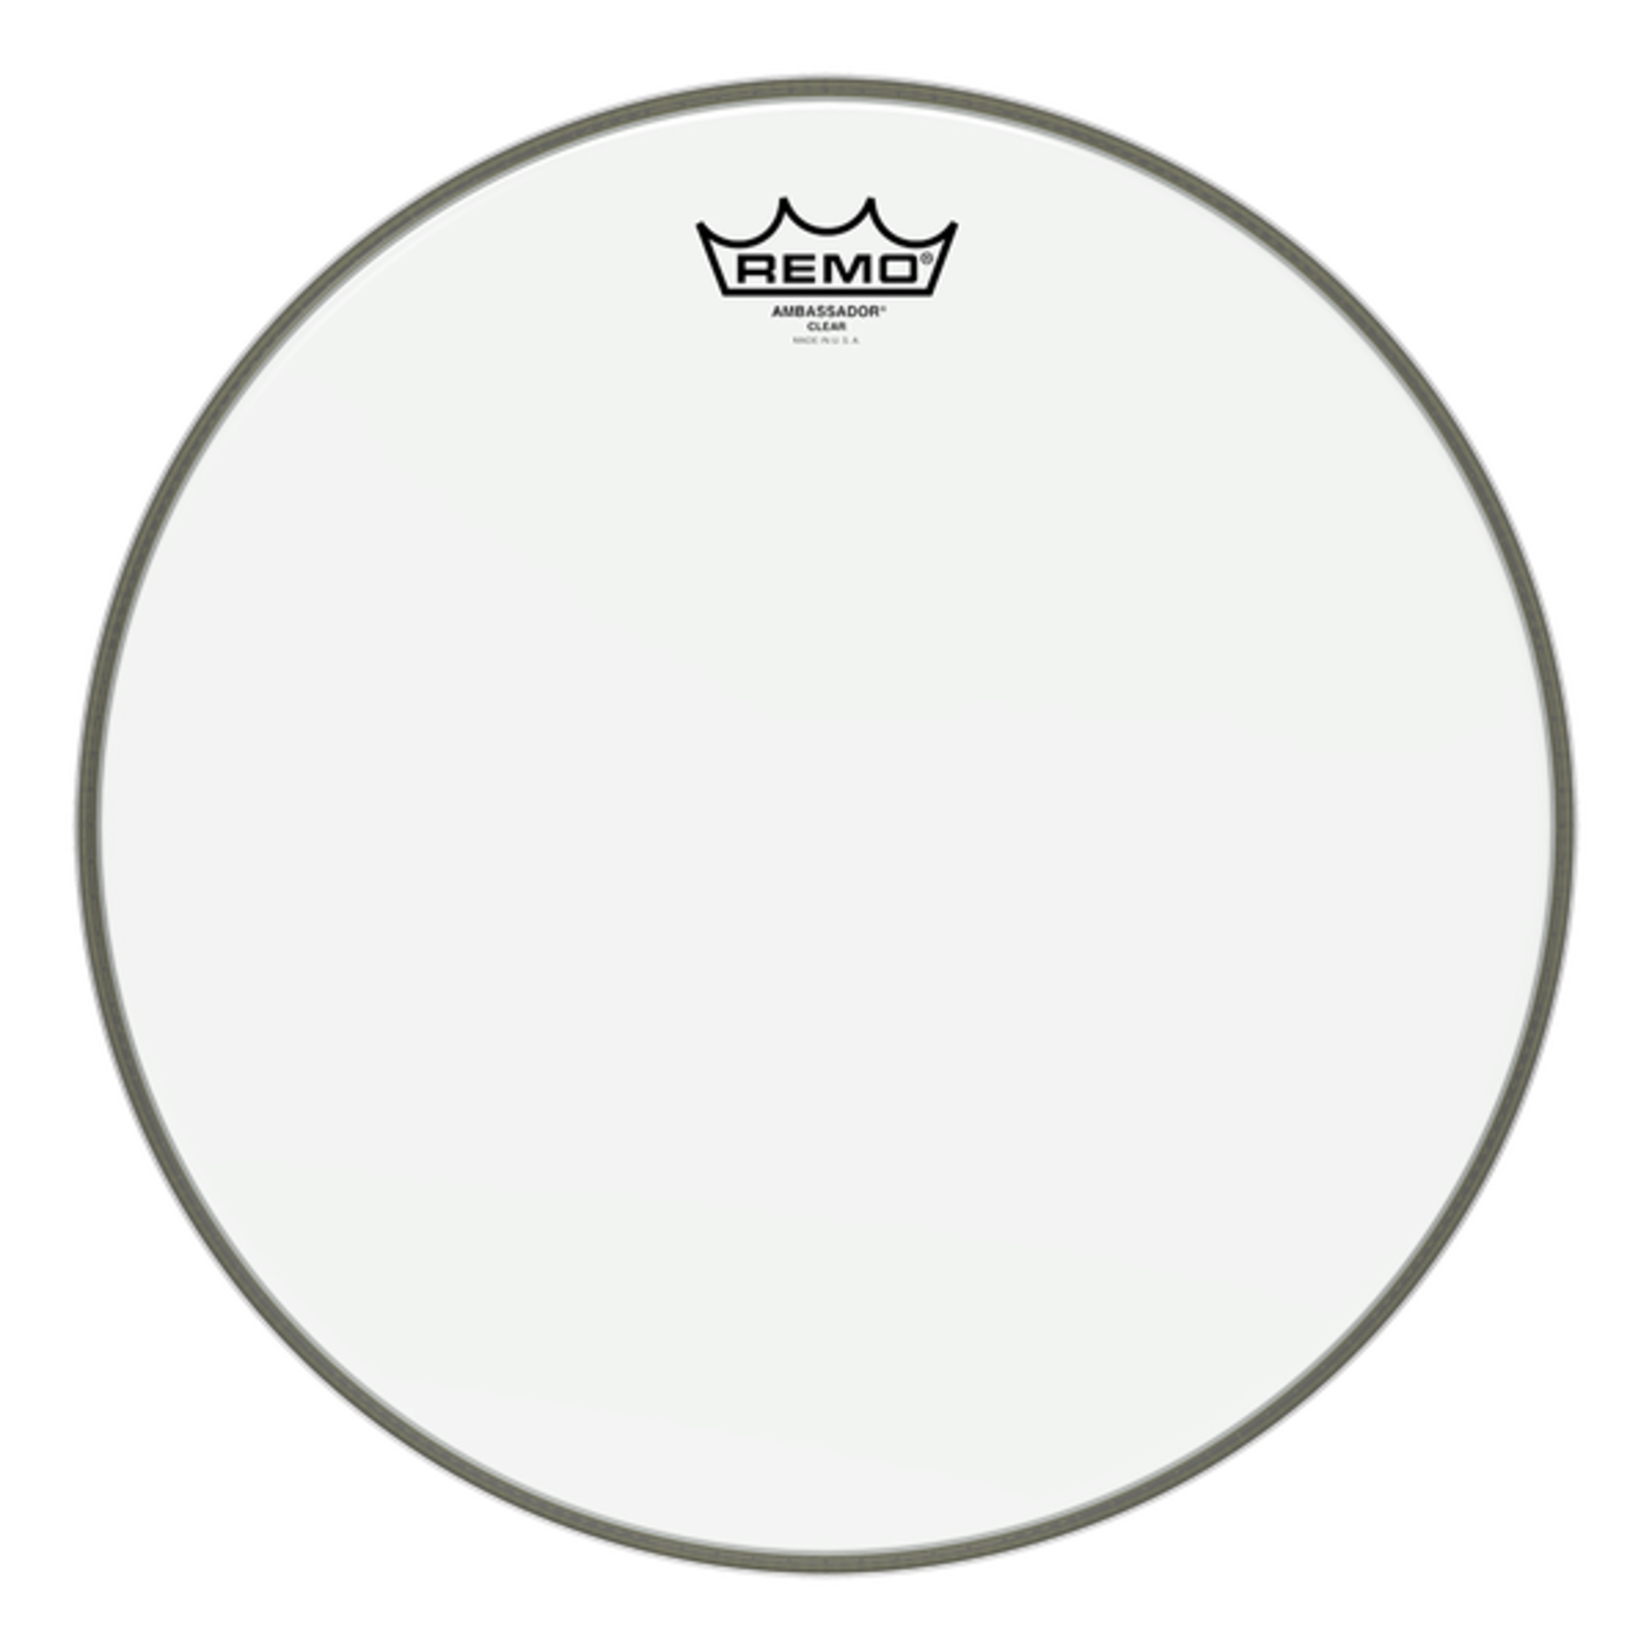 Remo Remo Clear Ambassador Bass Drum